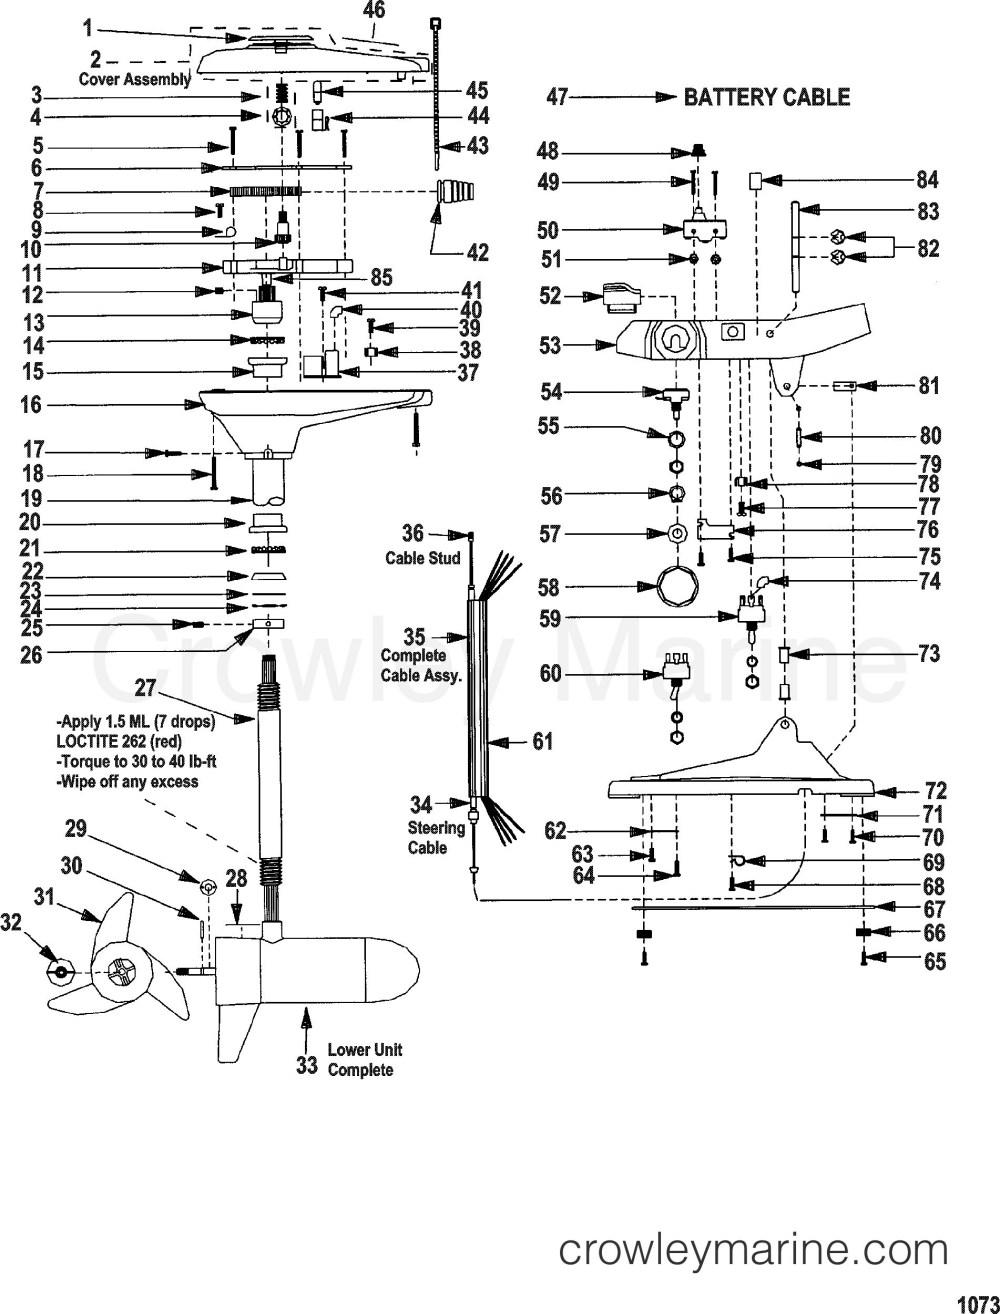 medium resolution of international dt466 engine diagram wiring diagram fo wiring diagram for dummies wiring diagrams of international dt466